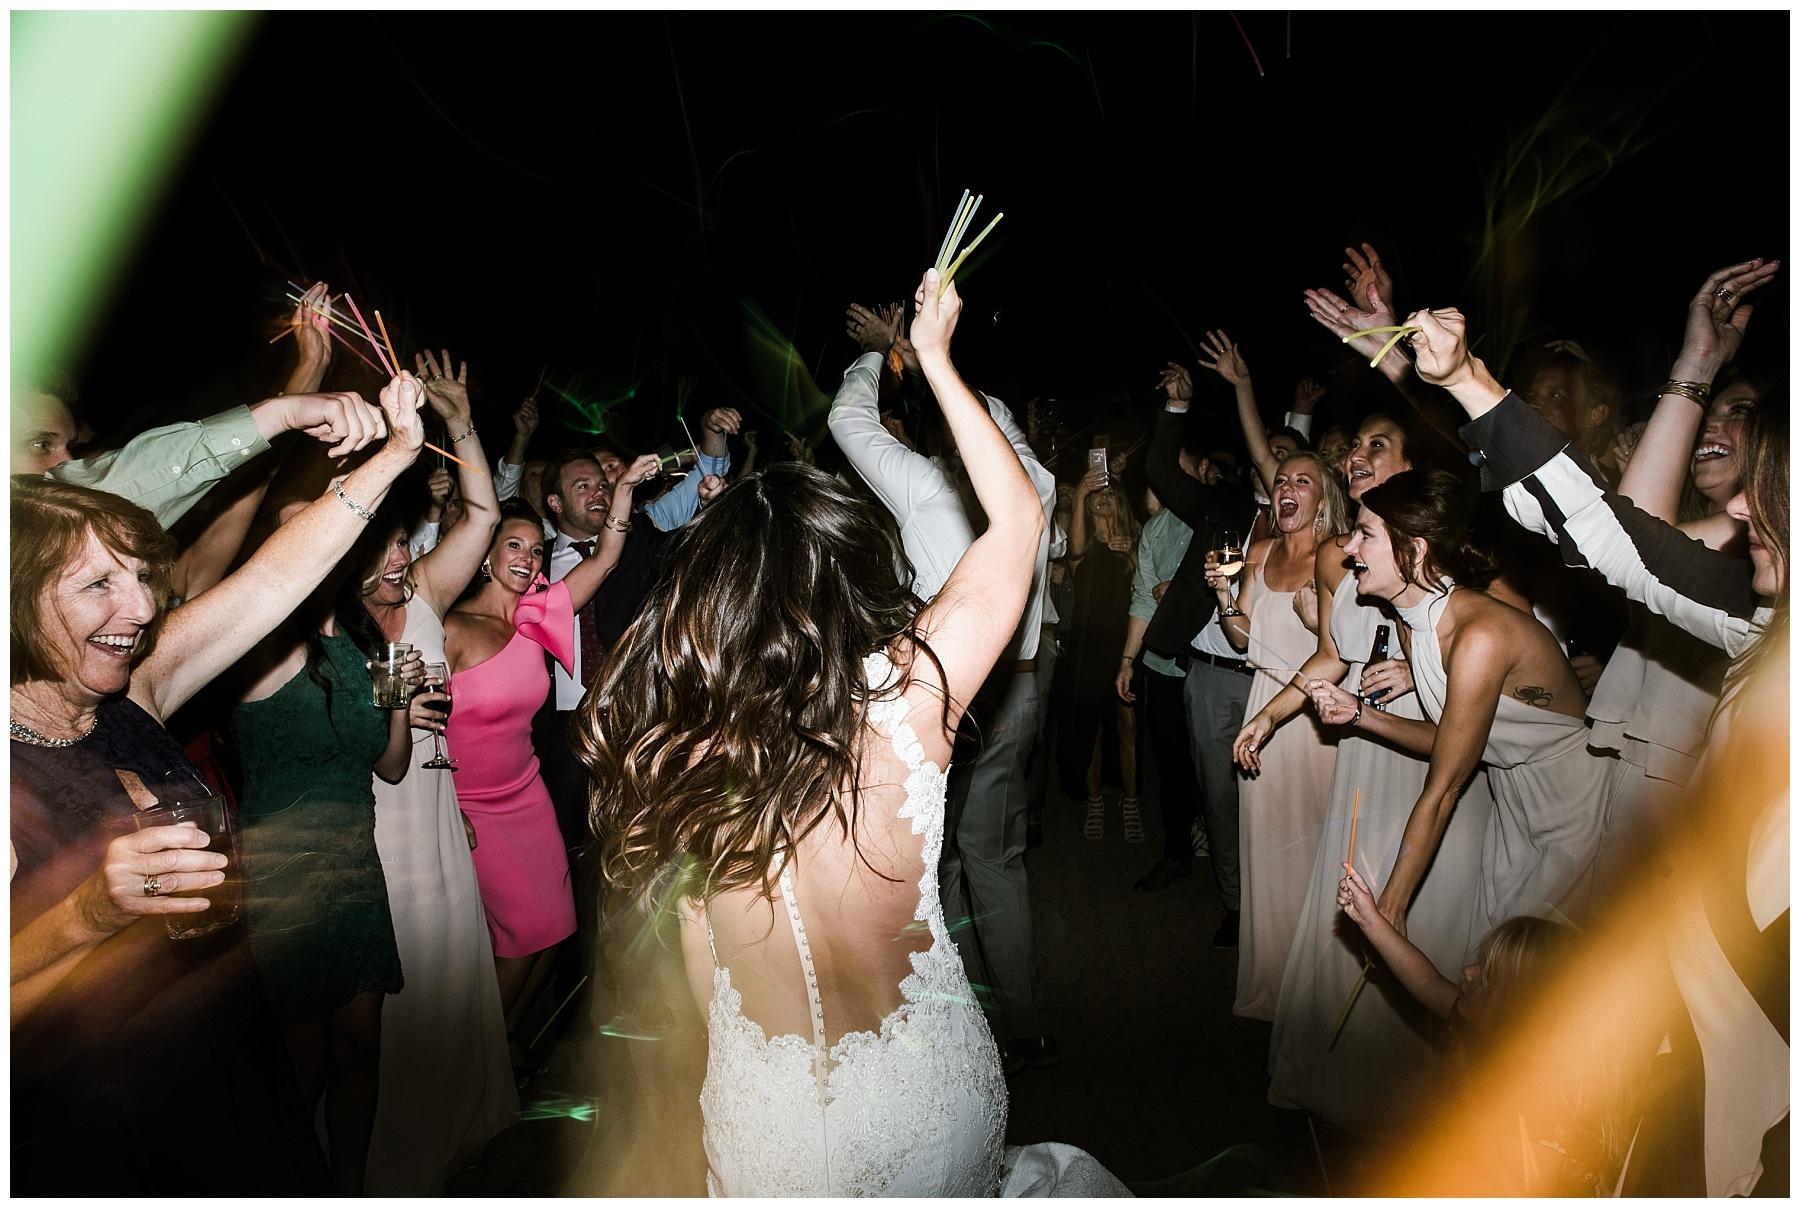 Katesalleyphotography-803_married in Breckenridge.jpg